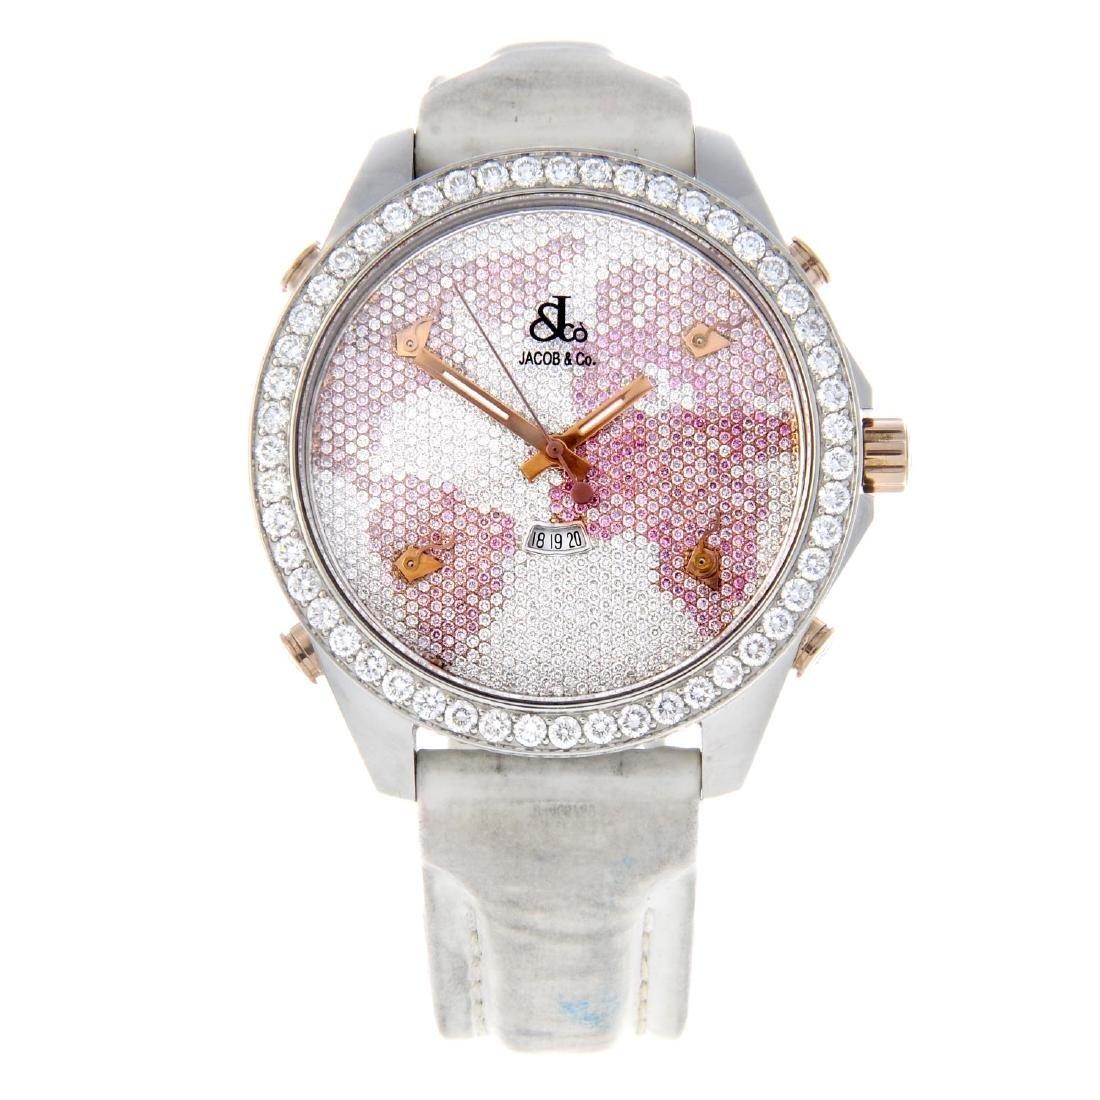 JACOB & CO - a lady's Five Time Zone wrist watch.